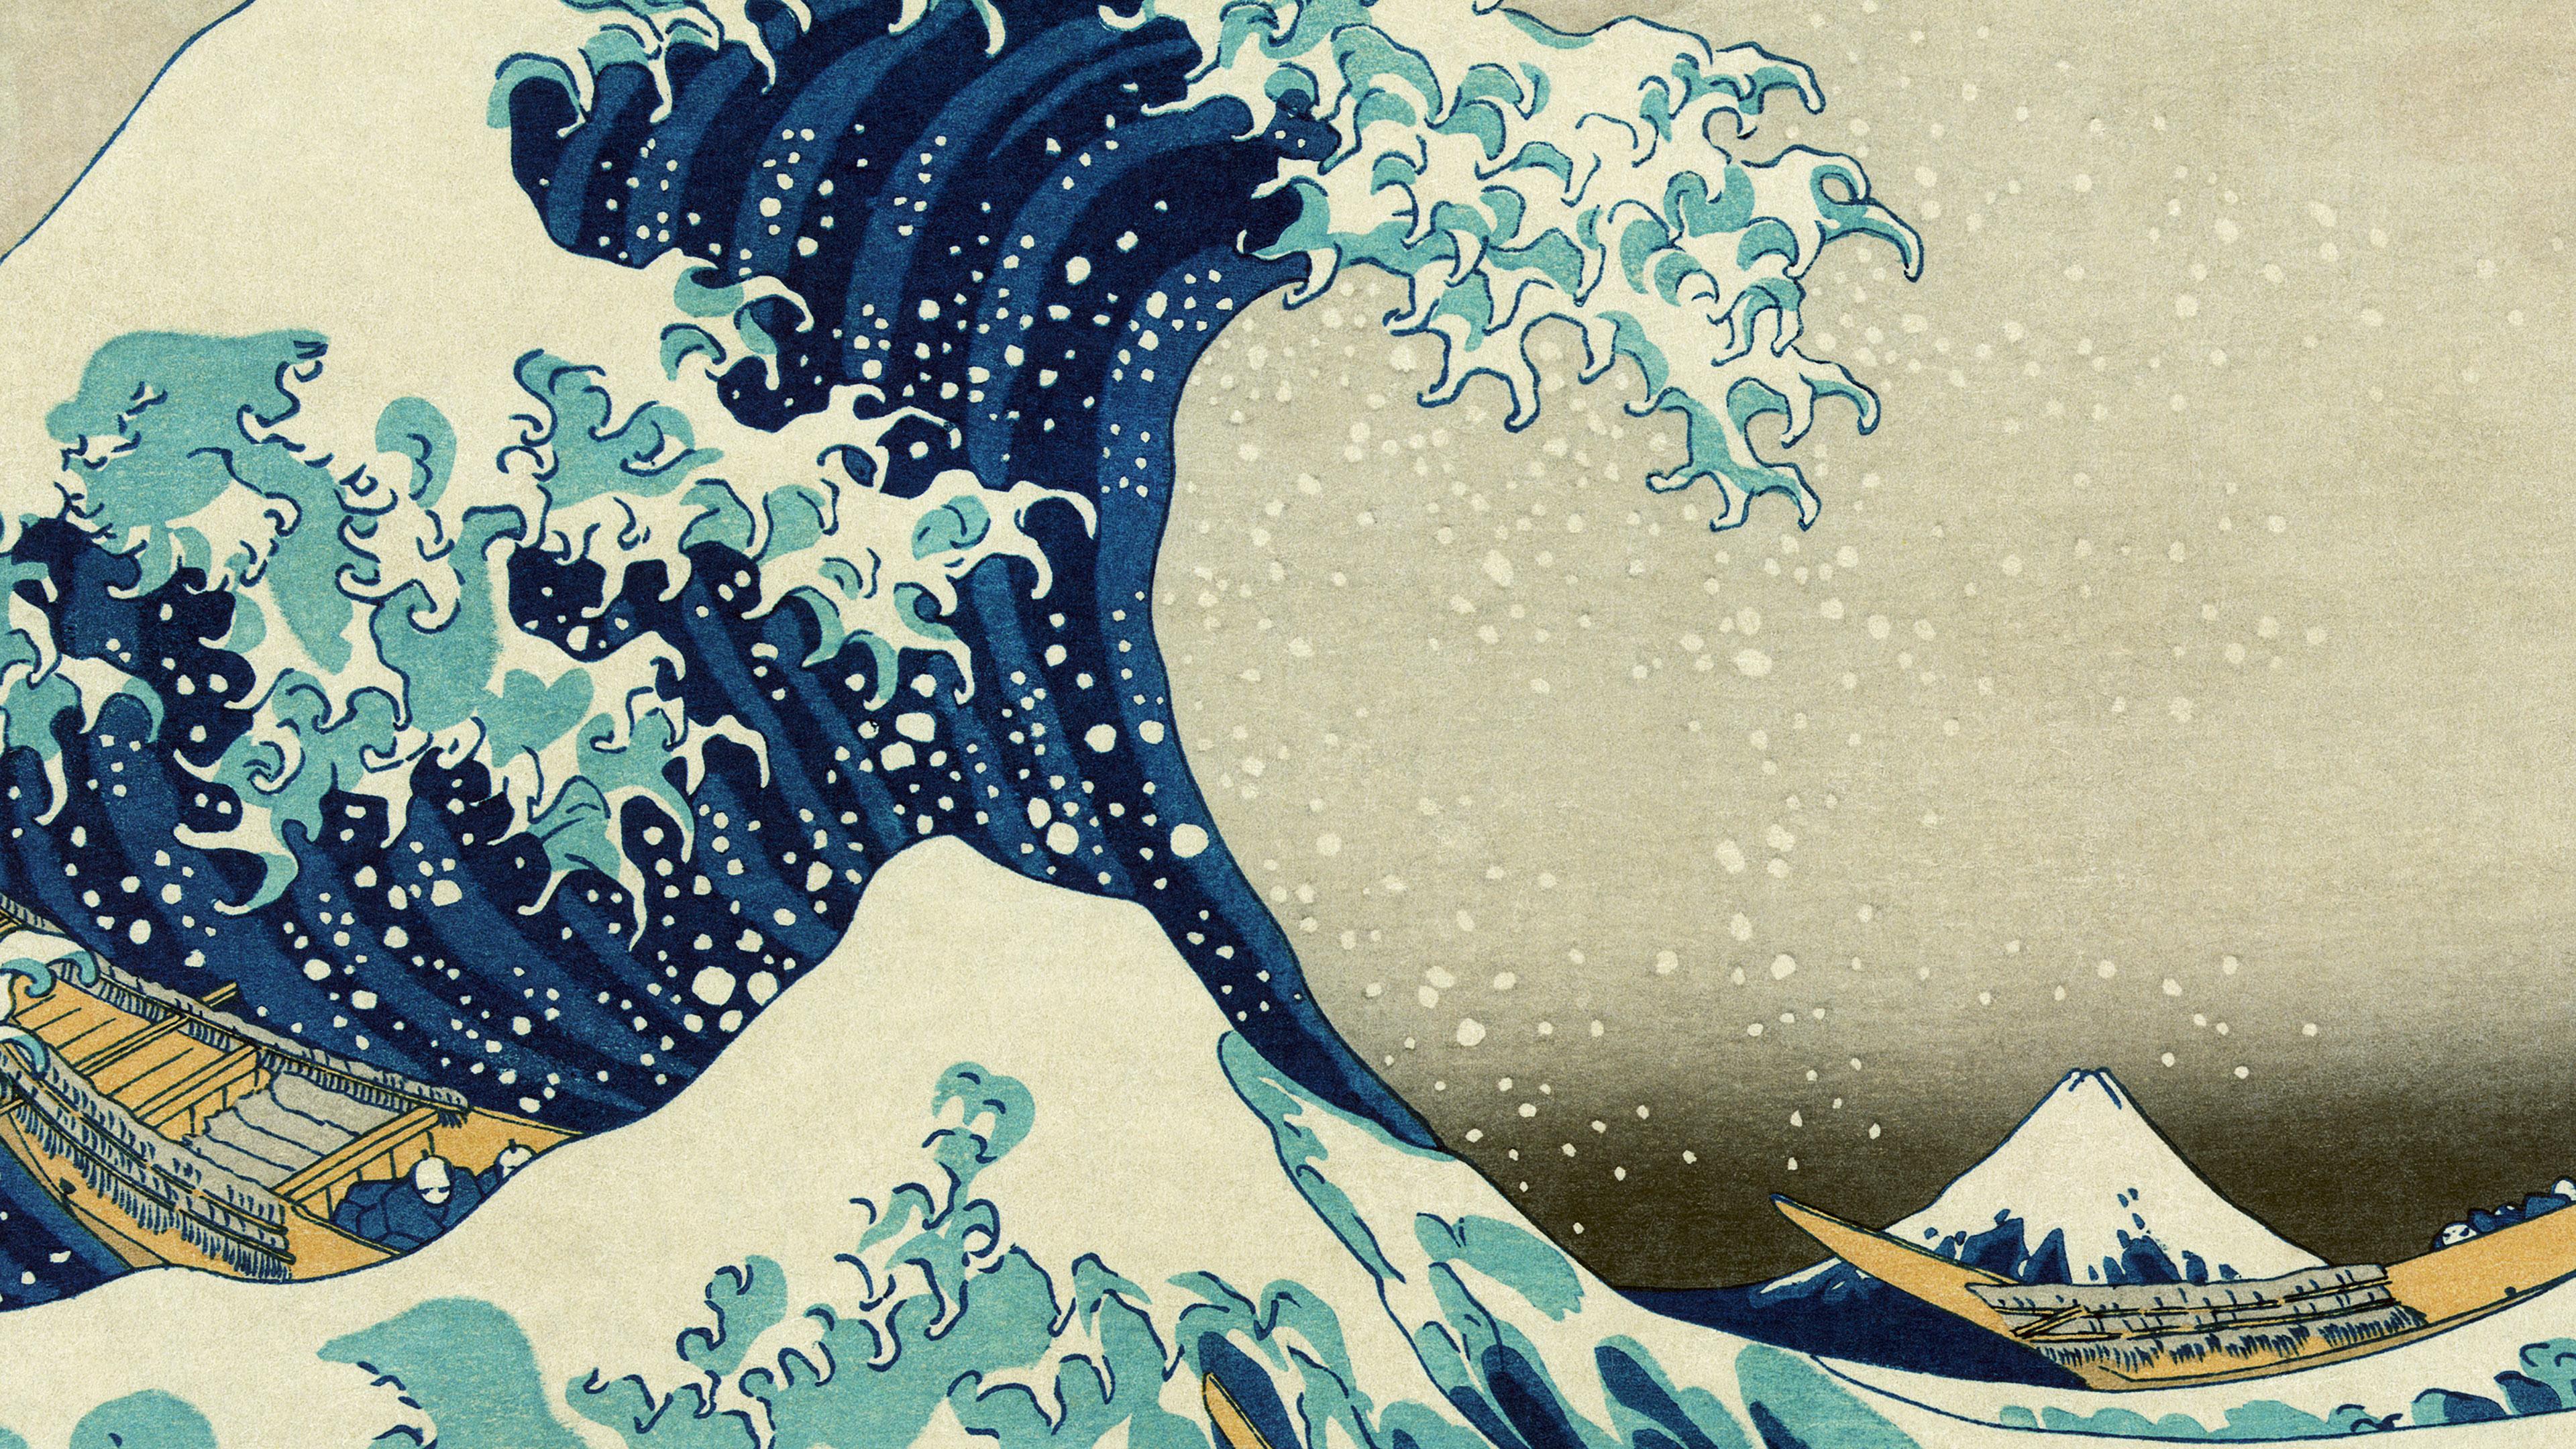 Fall Wallpaper For Desktop 1920x1080 Ab75 Wallpaper Great Wave Off Kanagawa Wallpaper